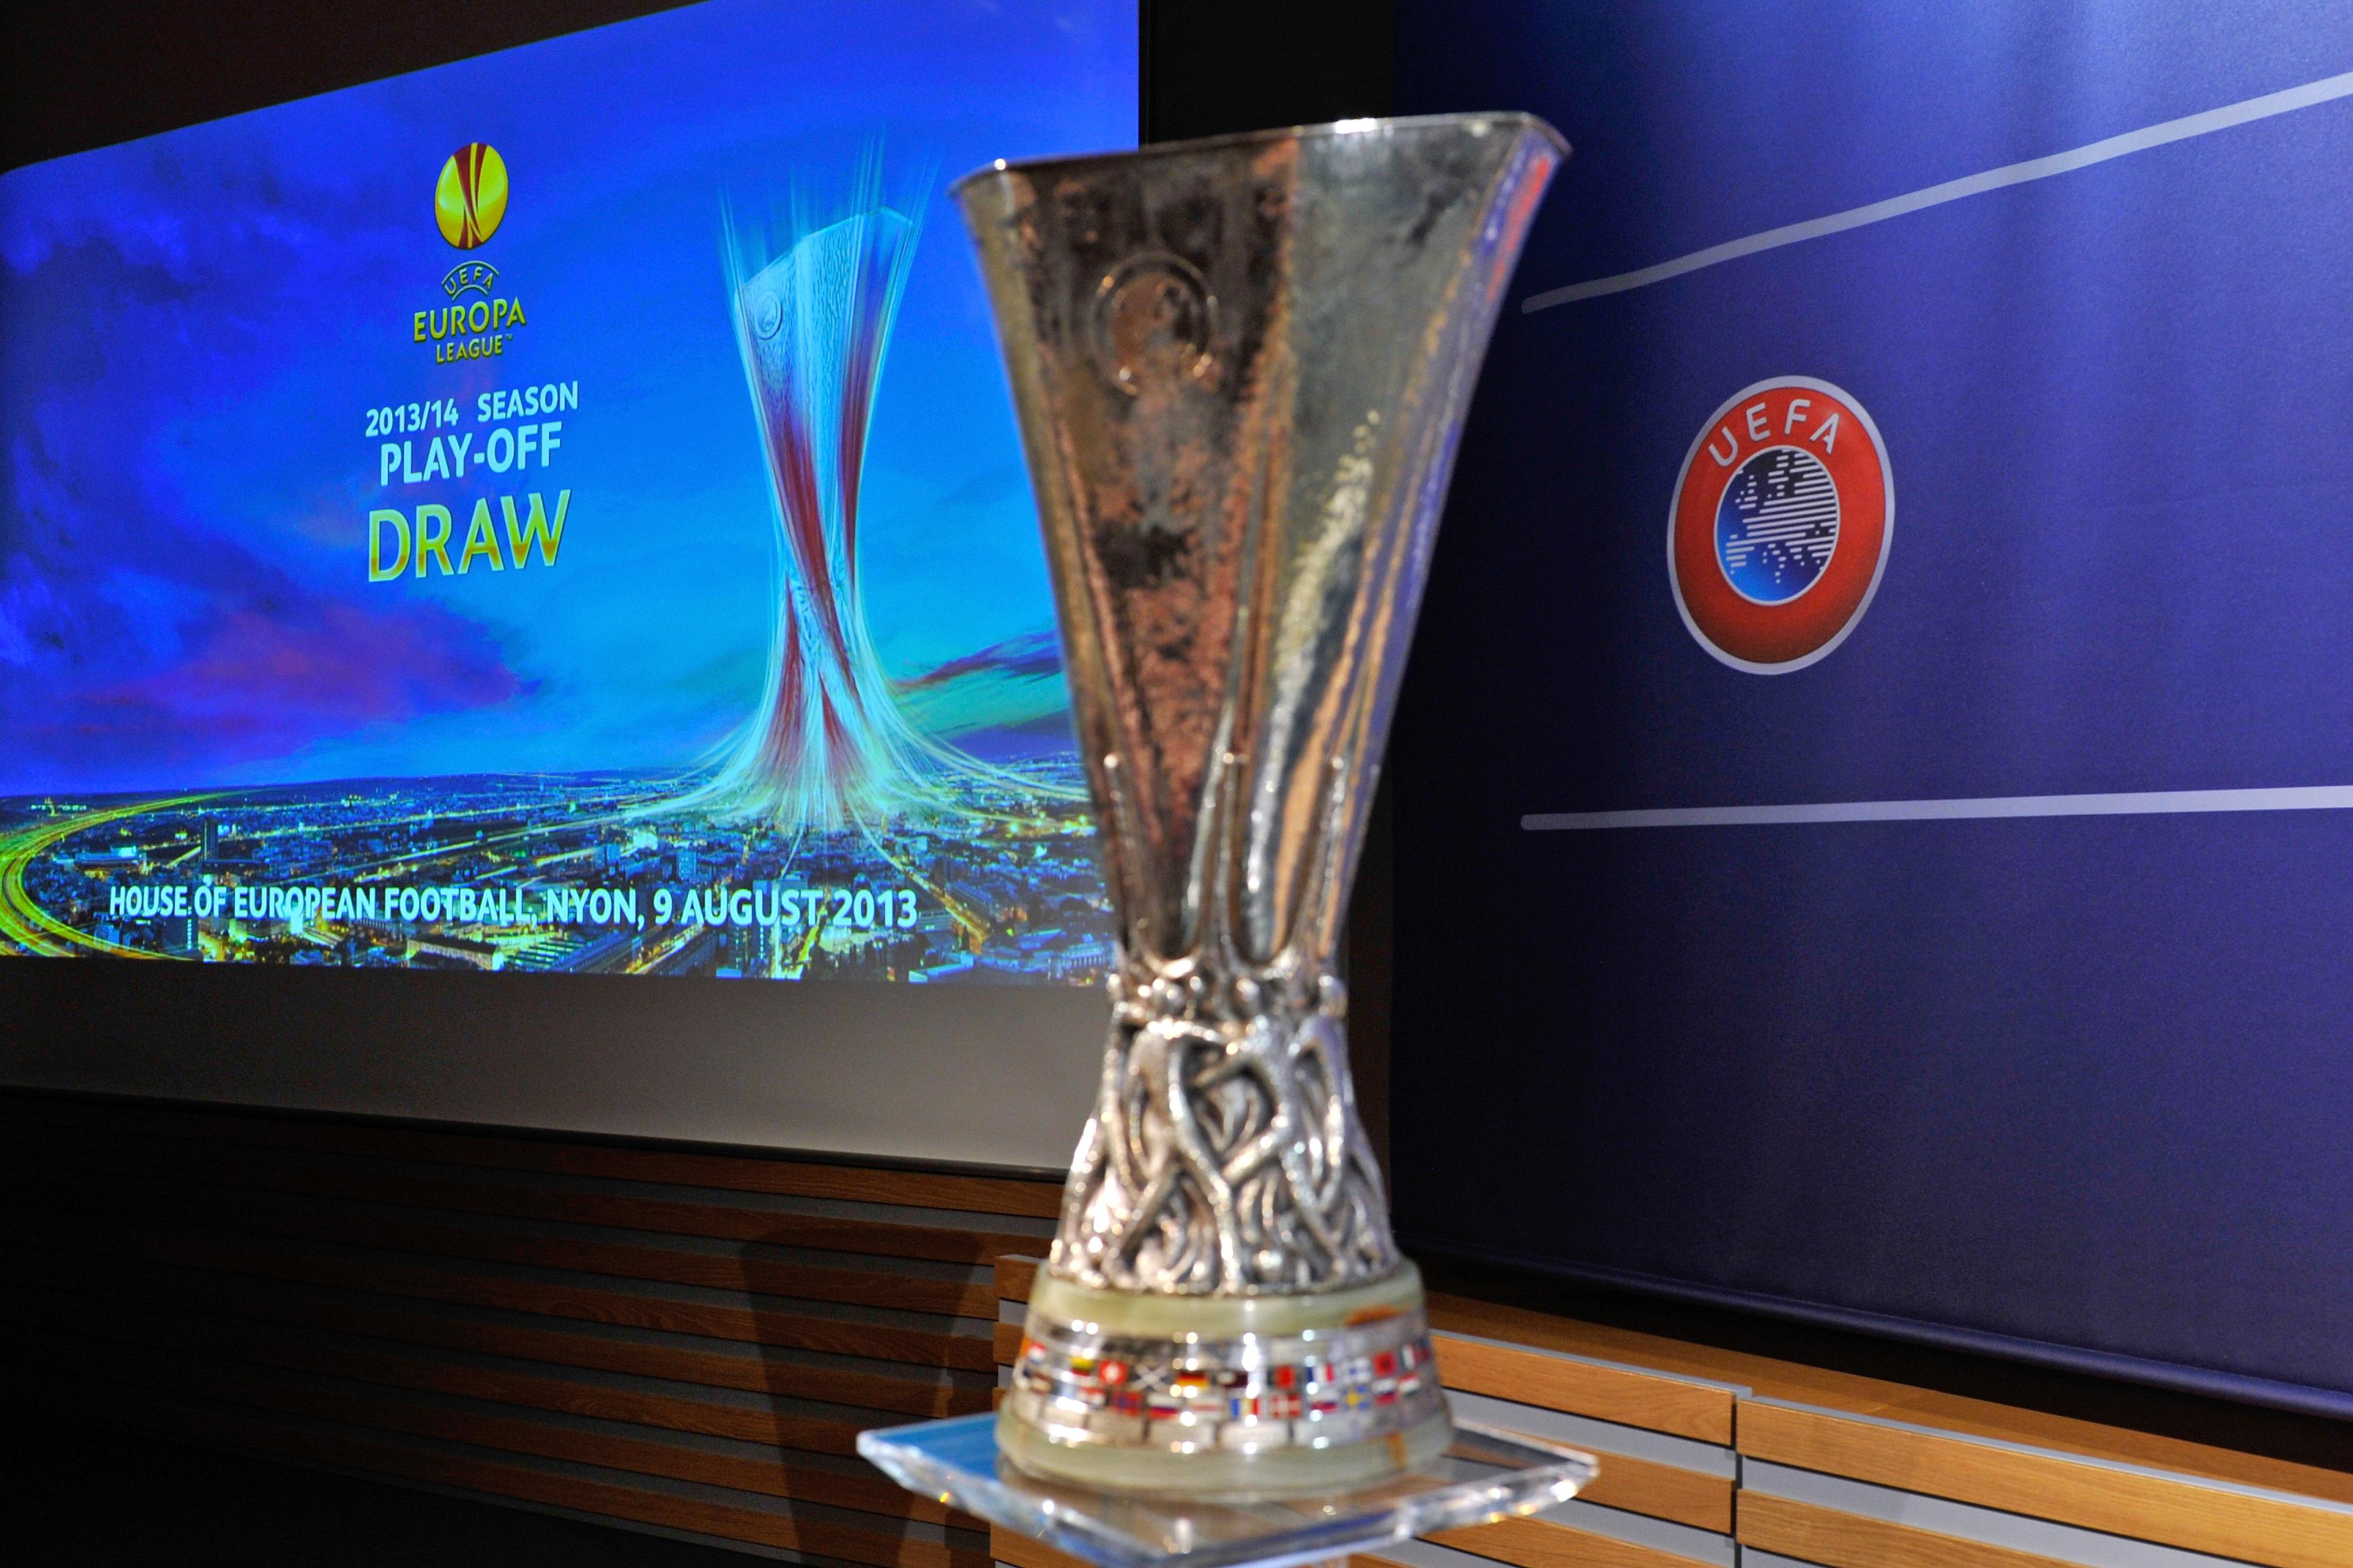 Tottenham head to Georgia for Europa League playoff